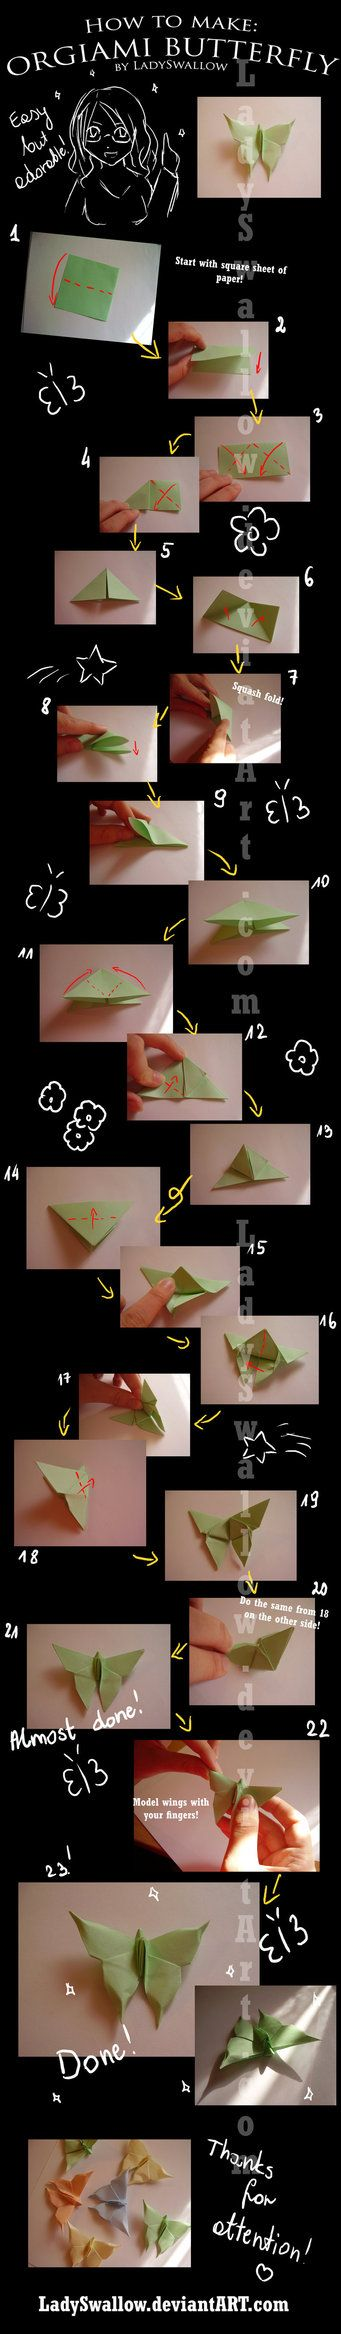 Cute Origami Butterflies!